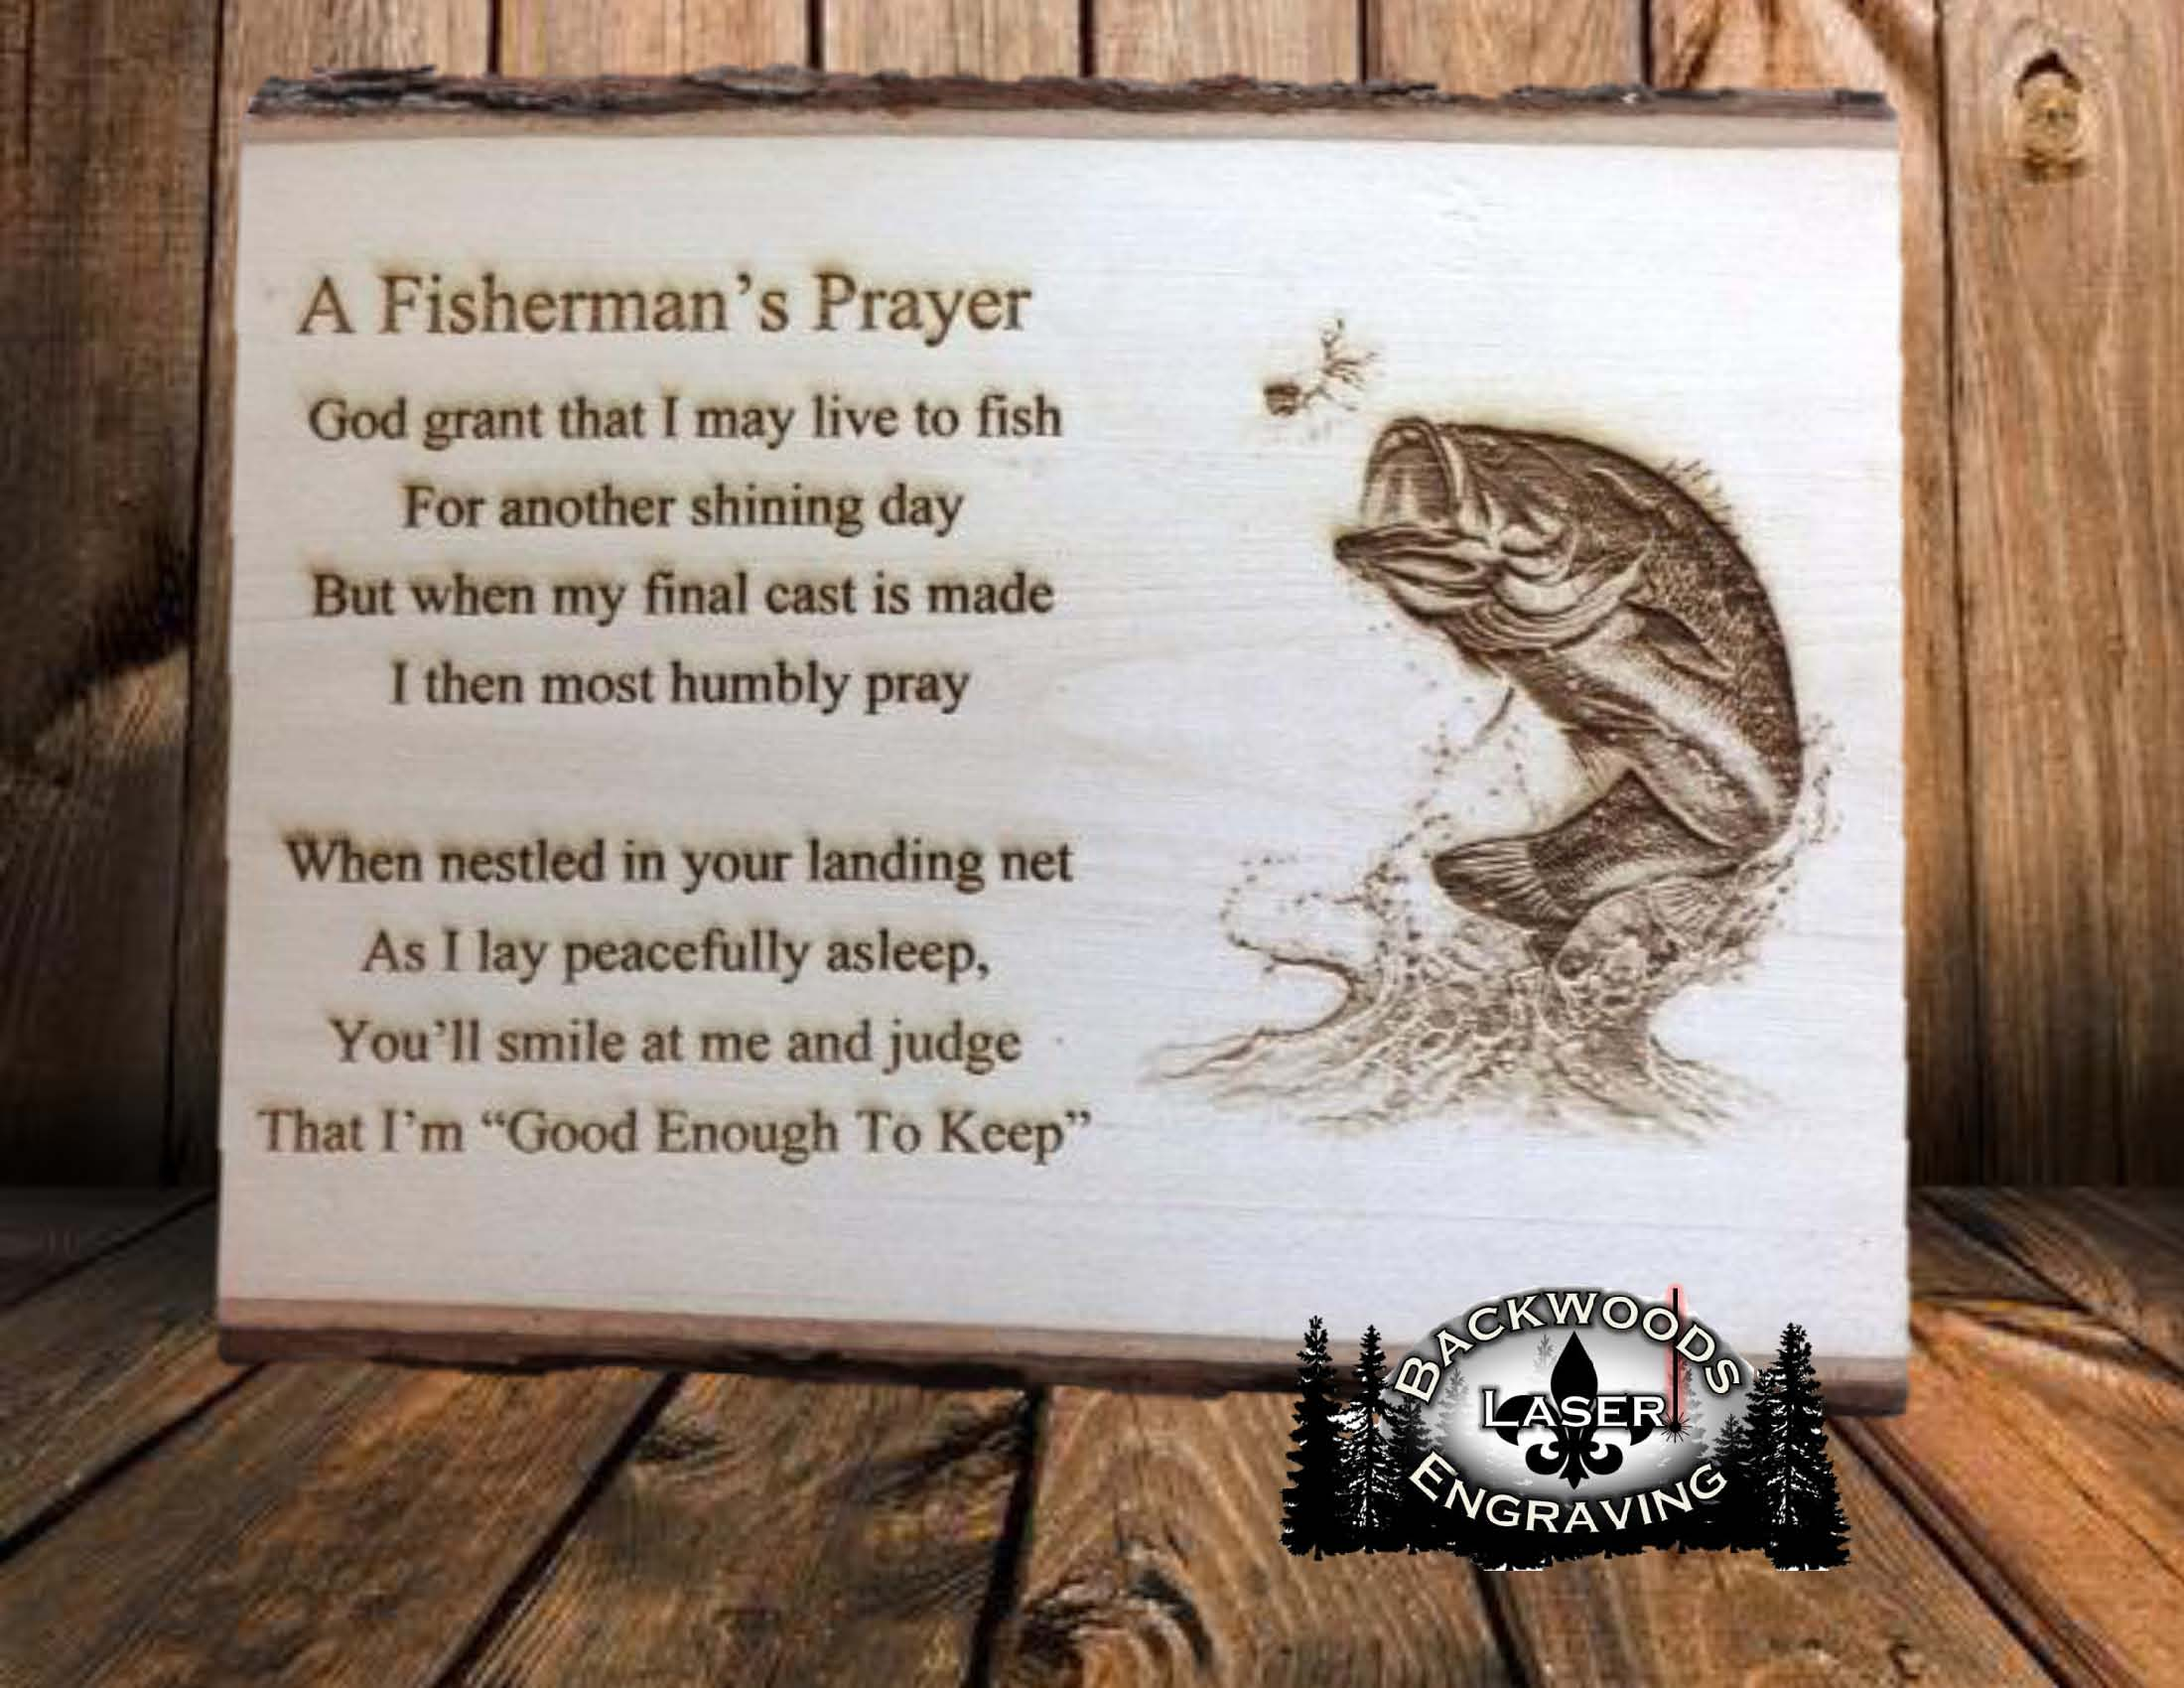 Fisherman S Prayer Backwoods Laser Engraving